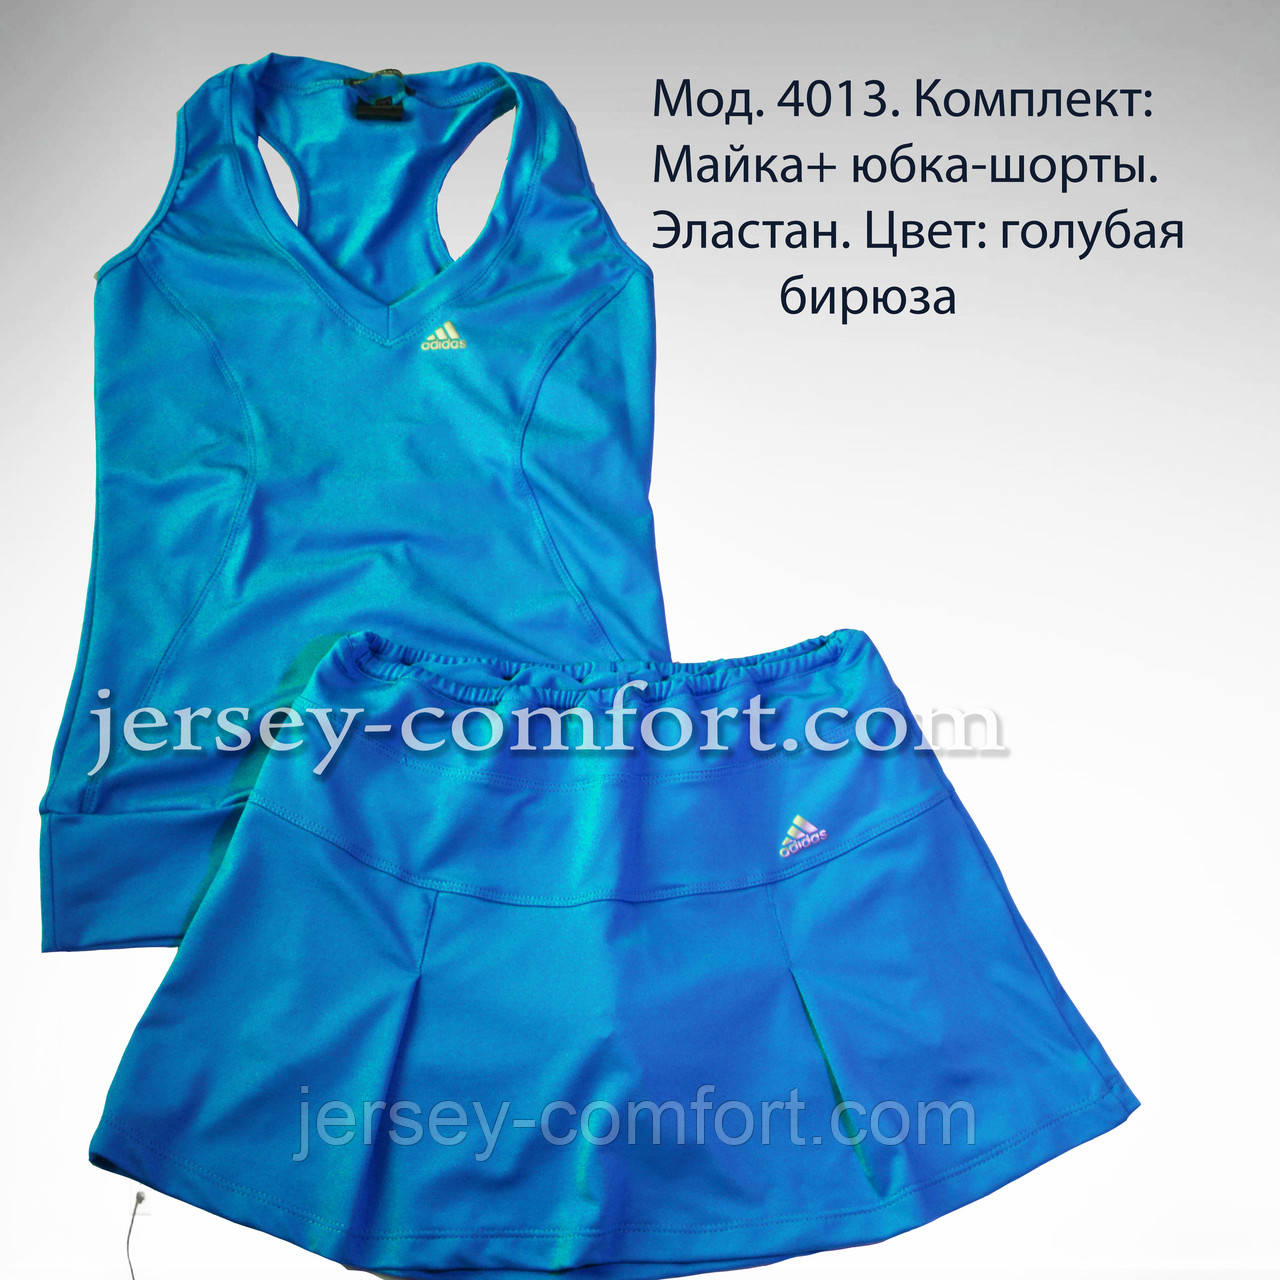 Комплект из эластана. Юбка-шорты и майка, бирюза. Мод. 4013. Разные цвета.